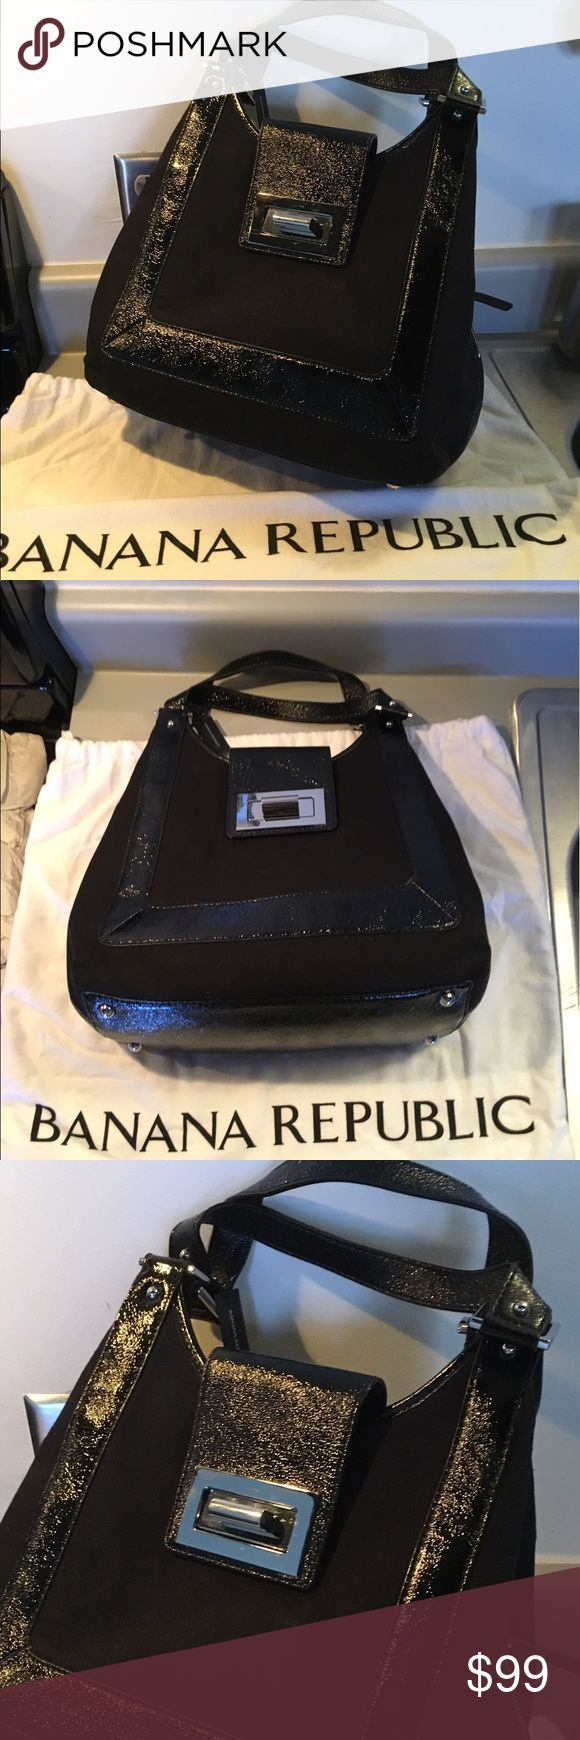 NWT Banana Republic Handbag Silver hardware. 3 divisions. Includes dust bag. Banana Republic Bags